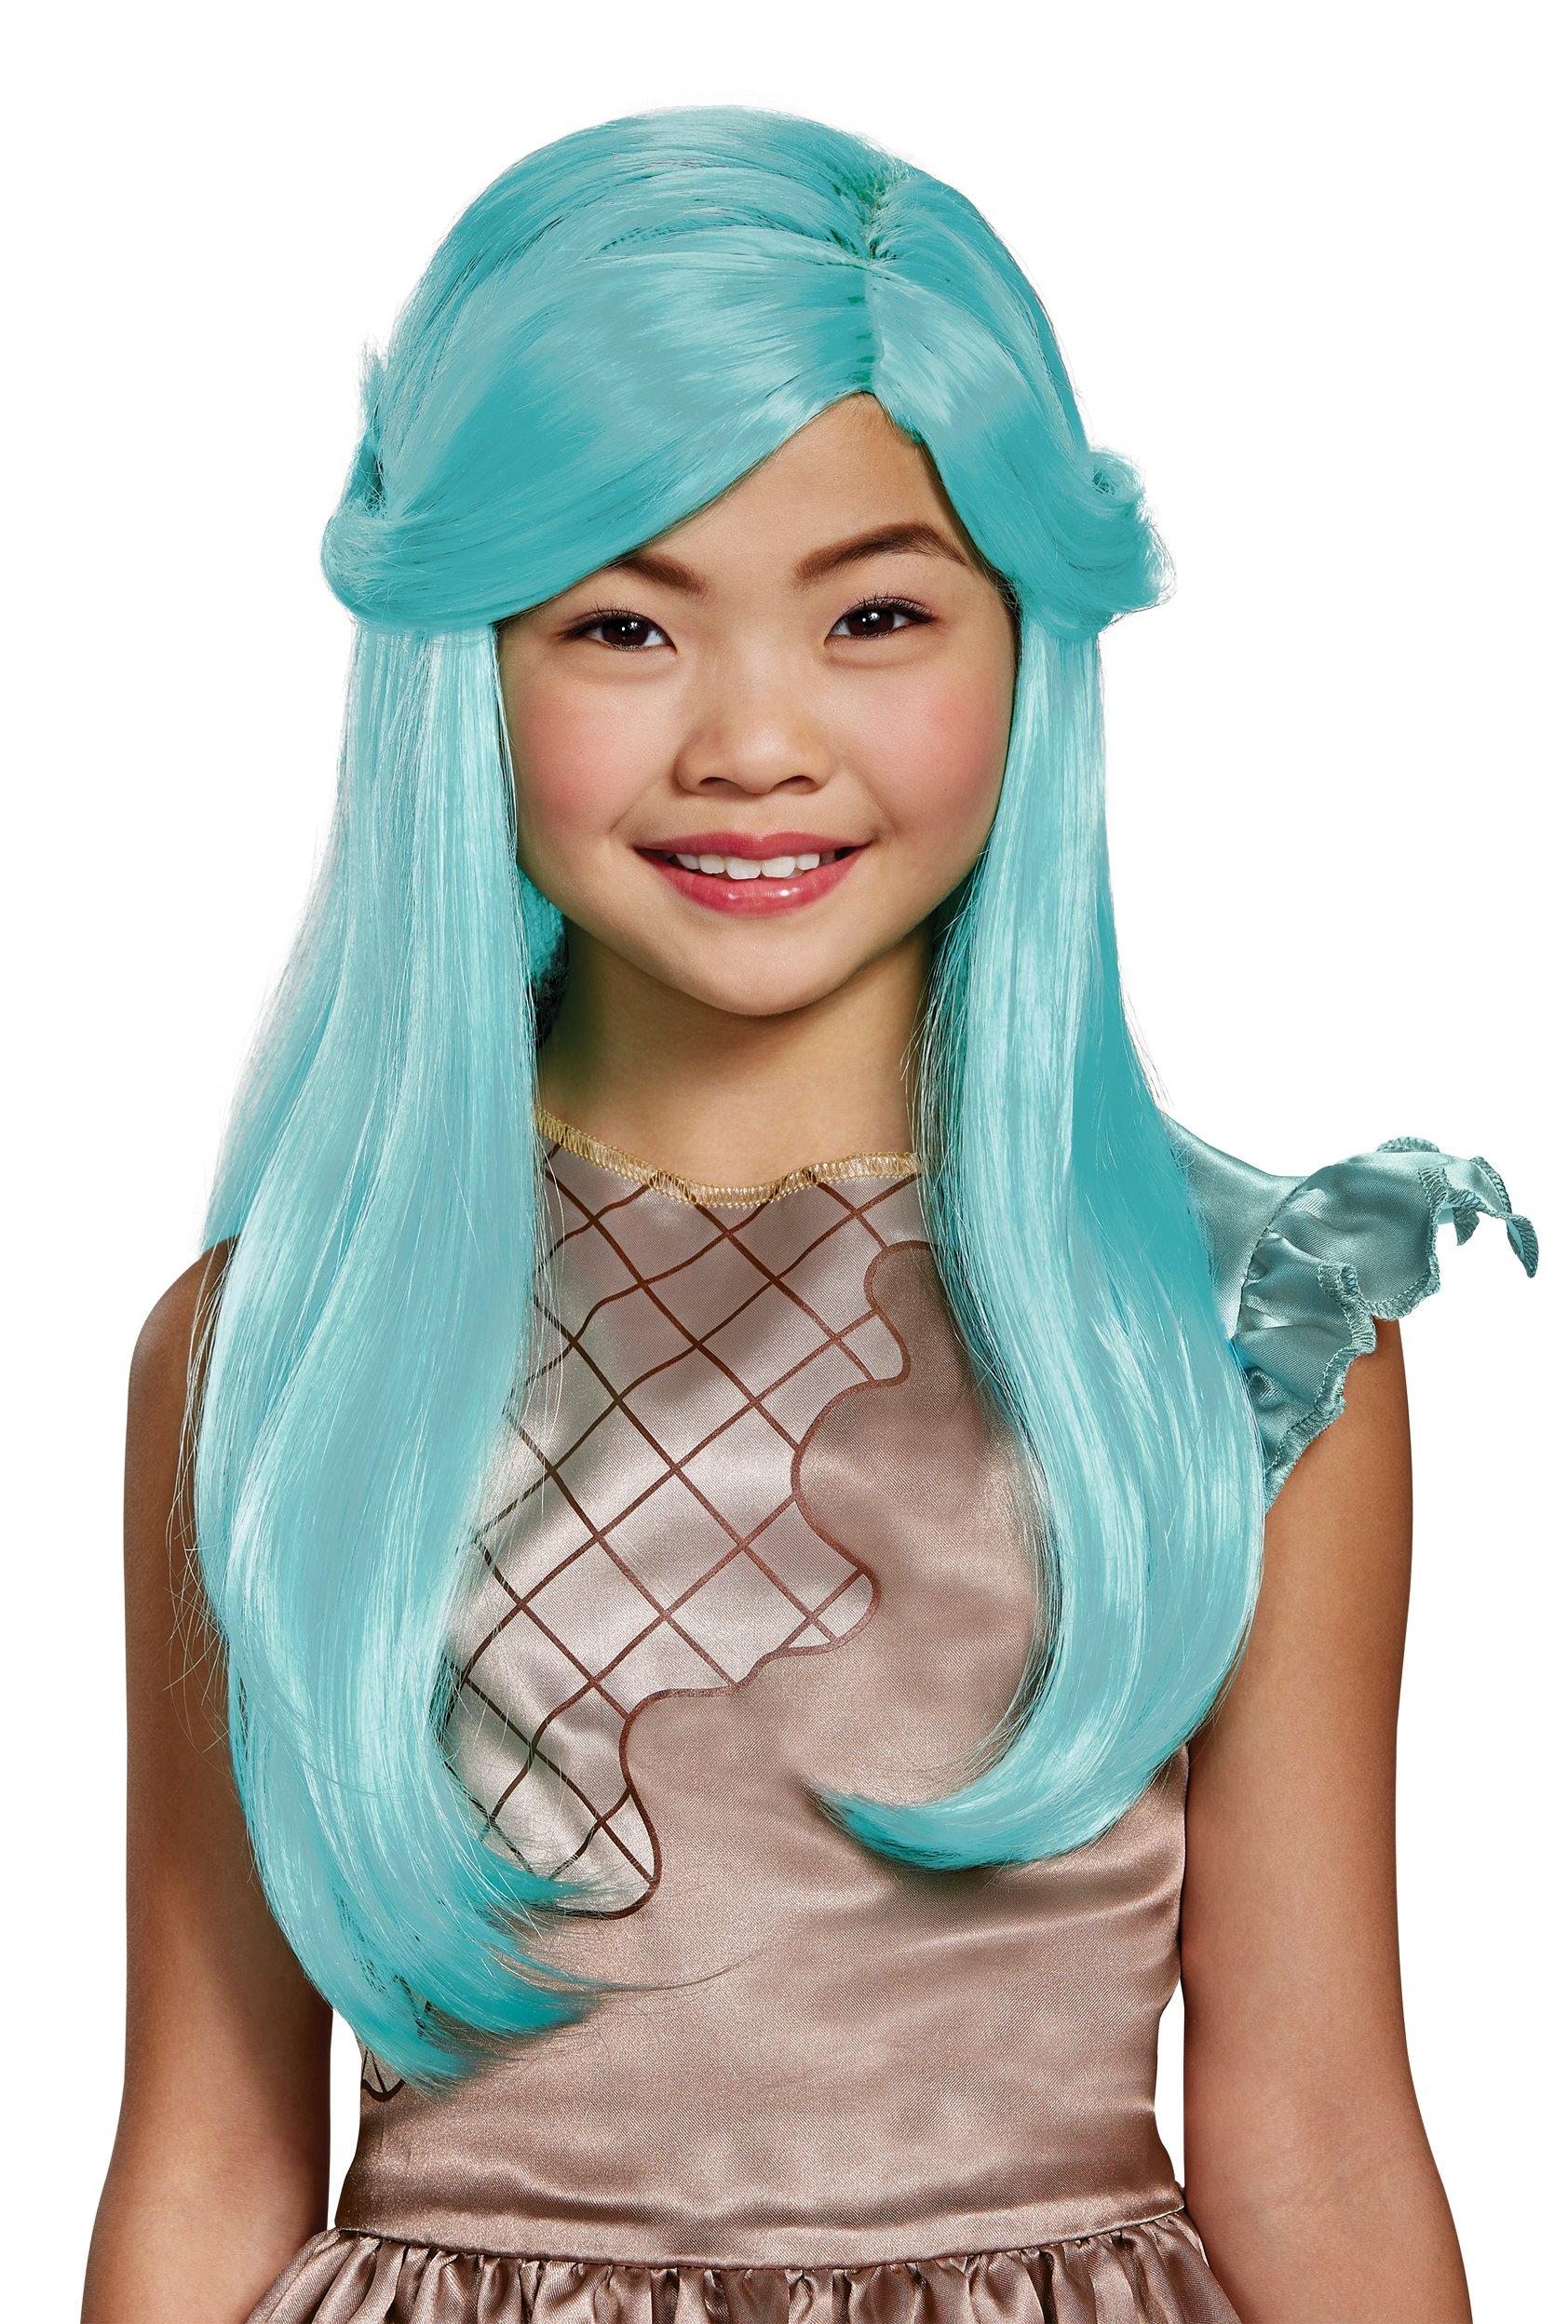 Peppa-Mint Child Shoppies Wig, One Size